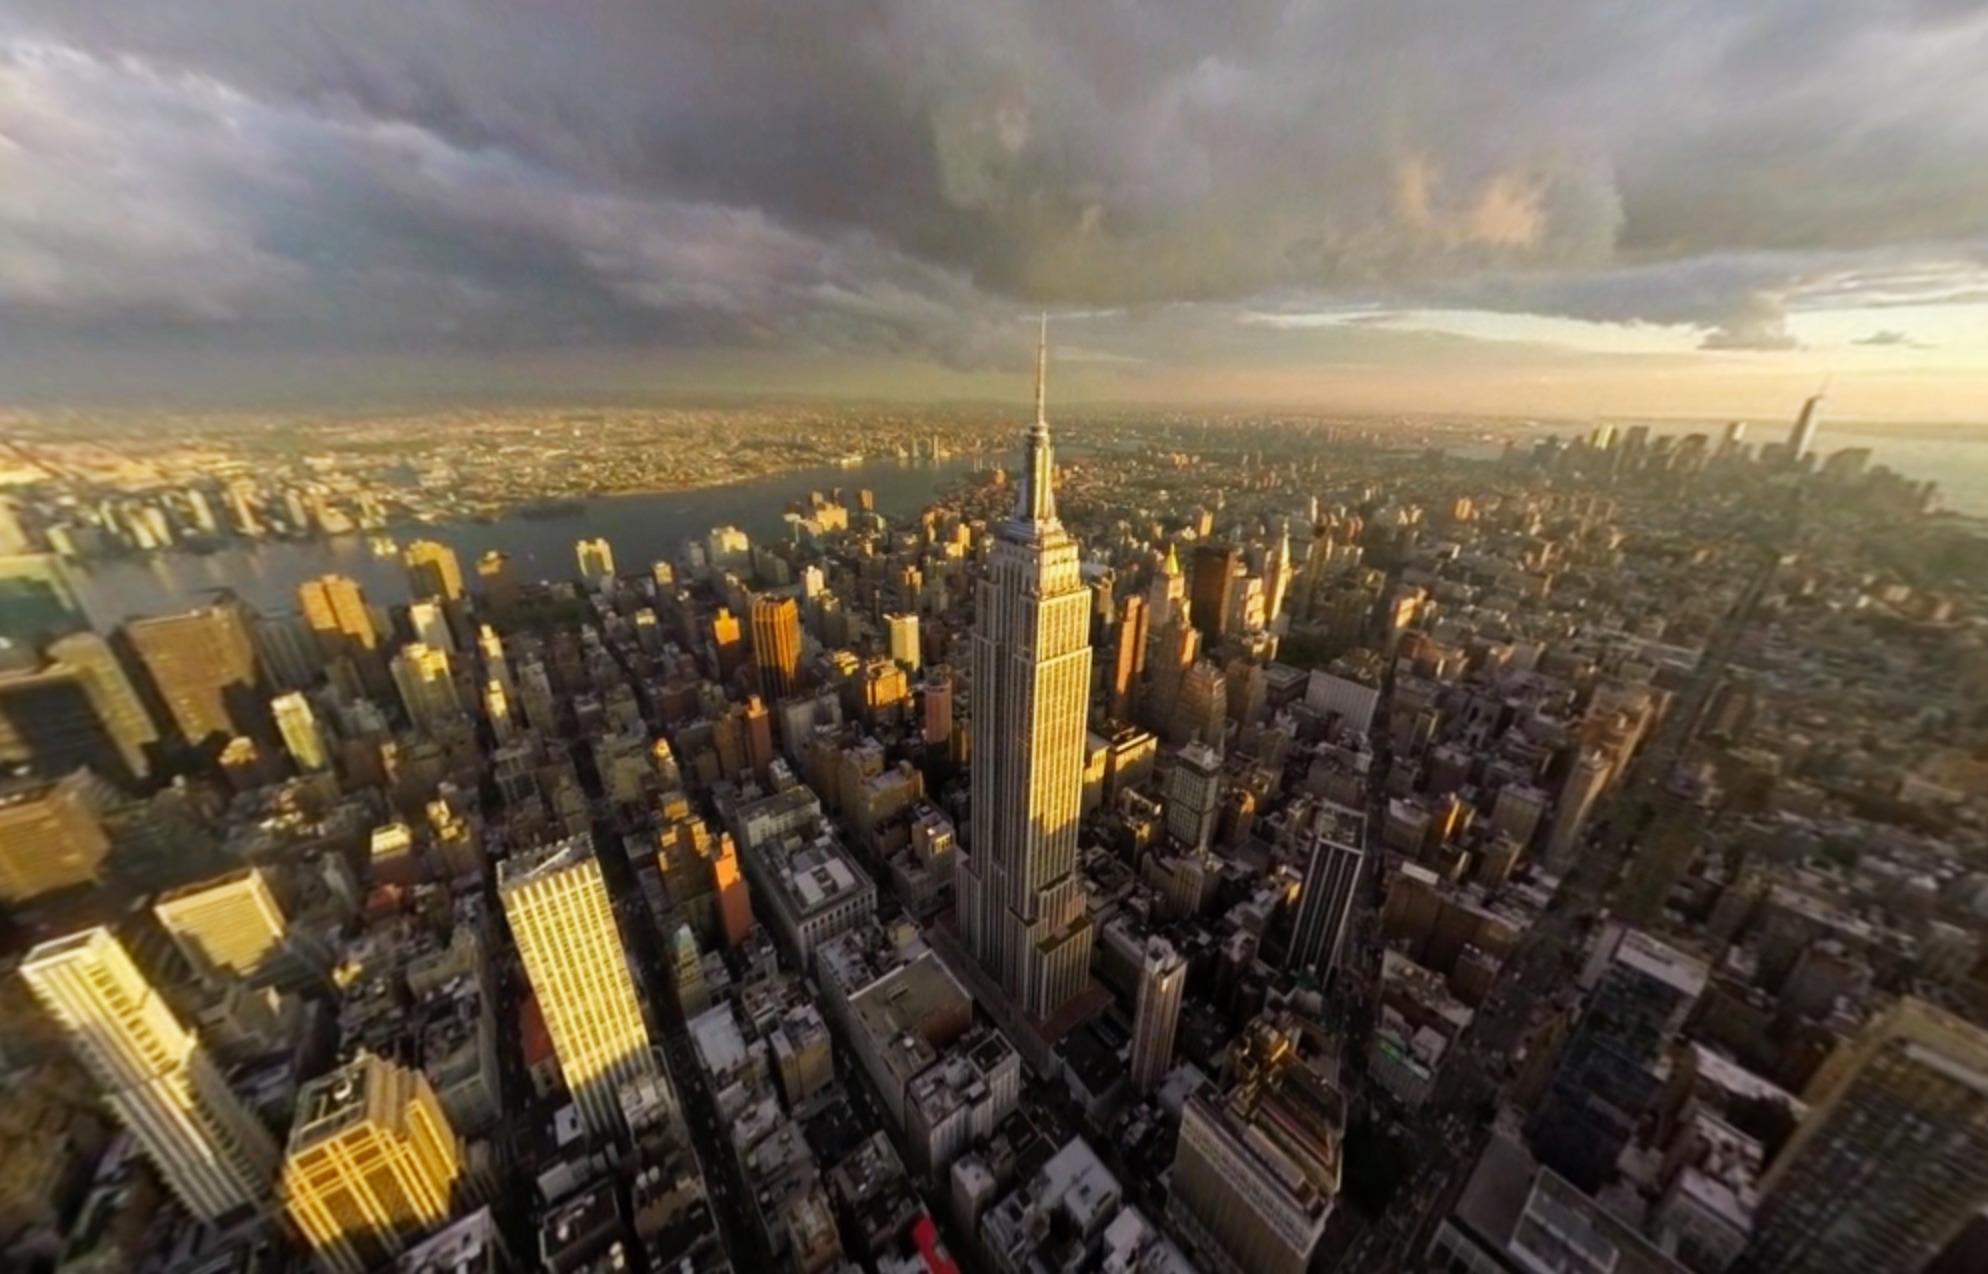 "alt=""ภาพวิว Manhattan ที่ดูผ่านแว่นVR ของบริษัท Thomas Cook"""